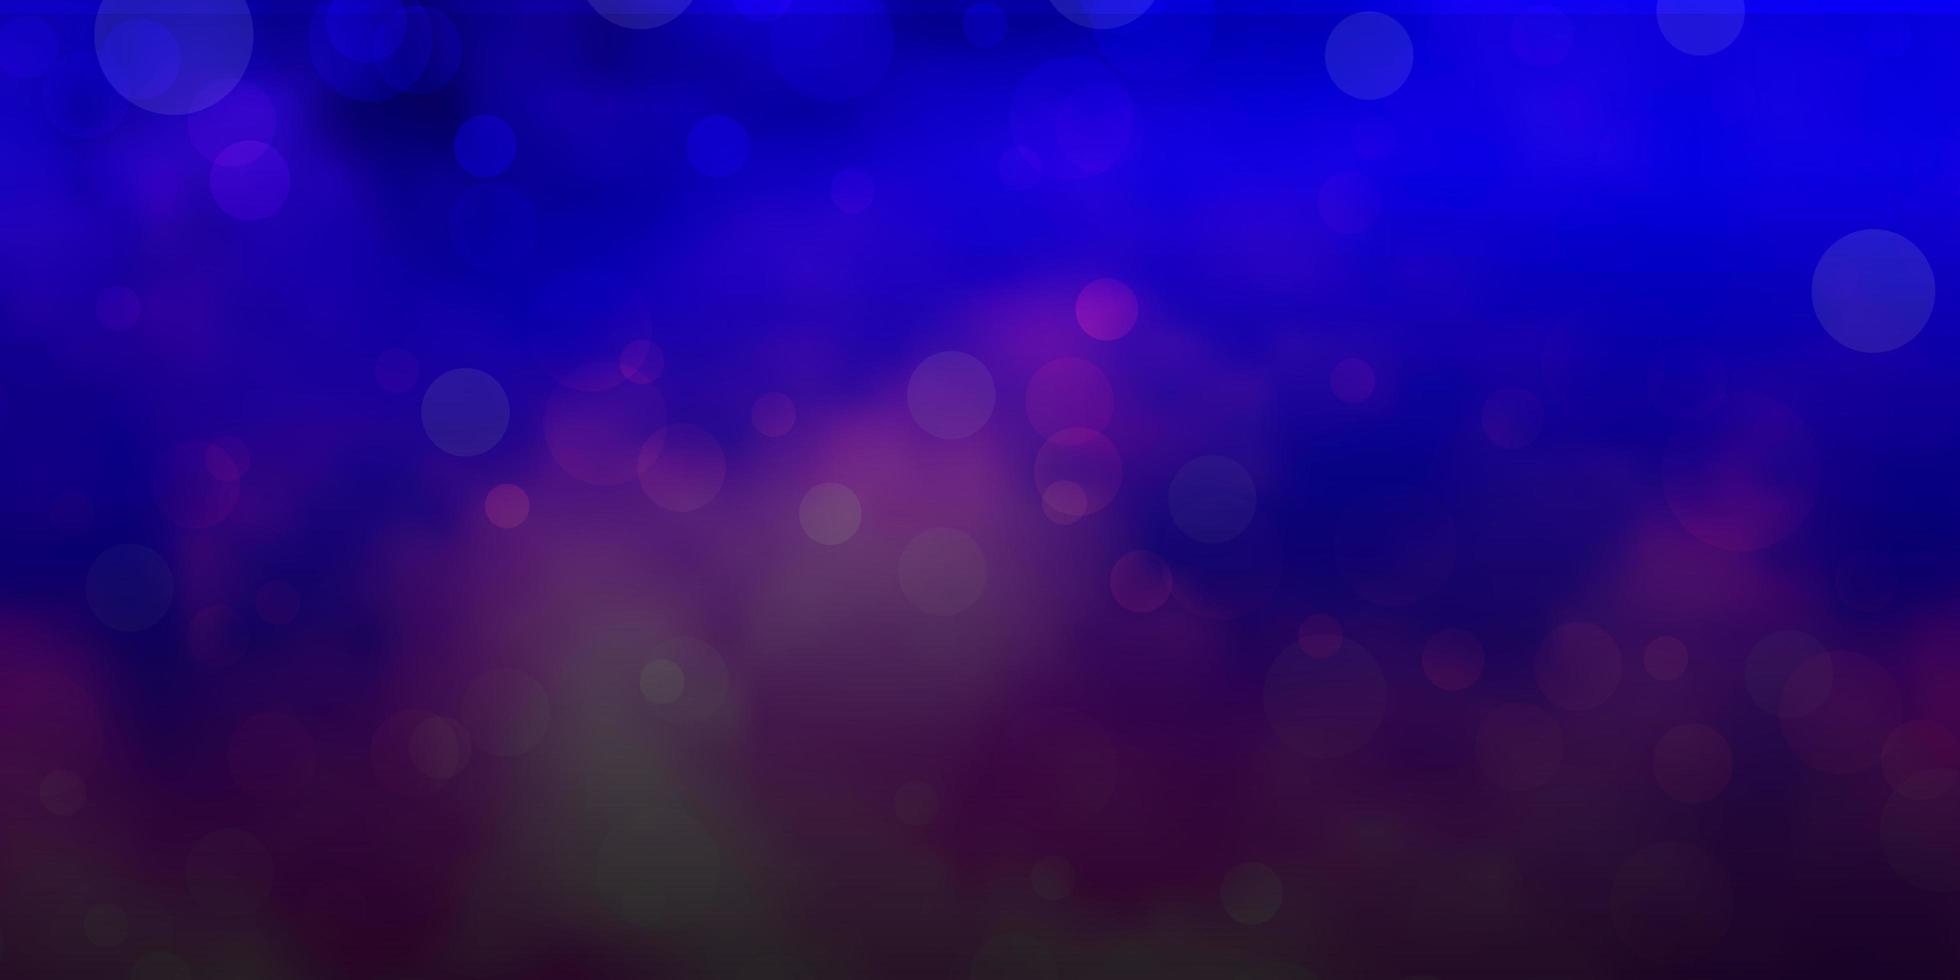 hellrosa, blaue Vektorschablone mit Kreisen. vektor